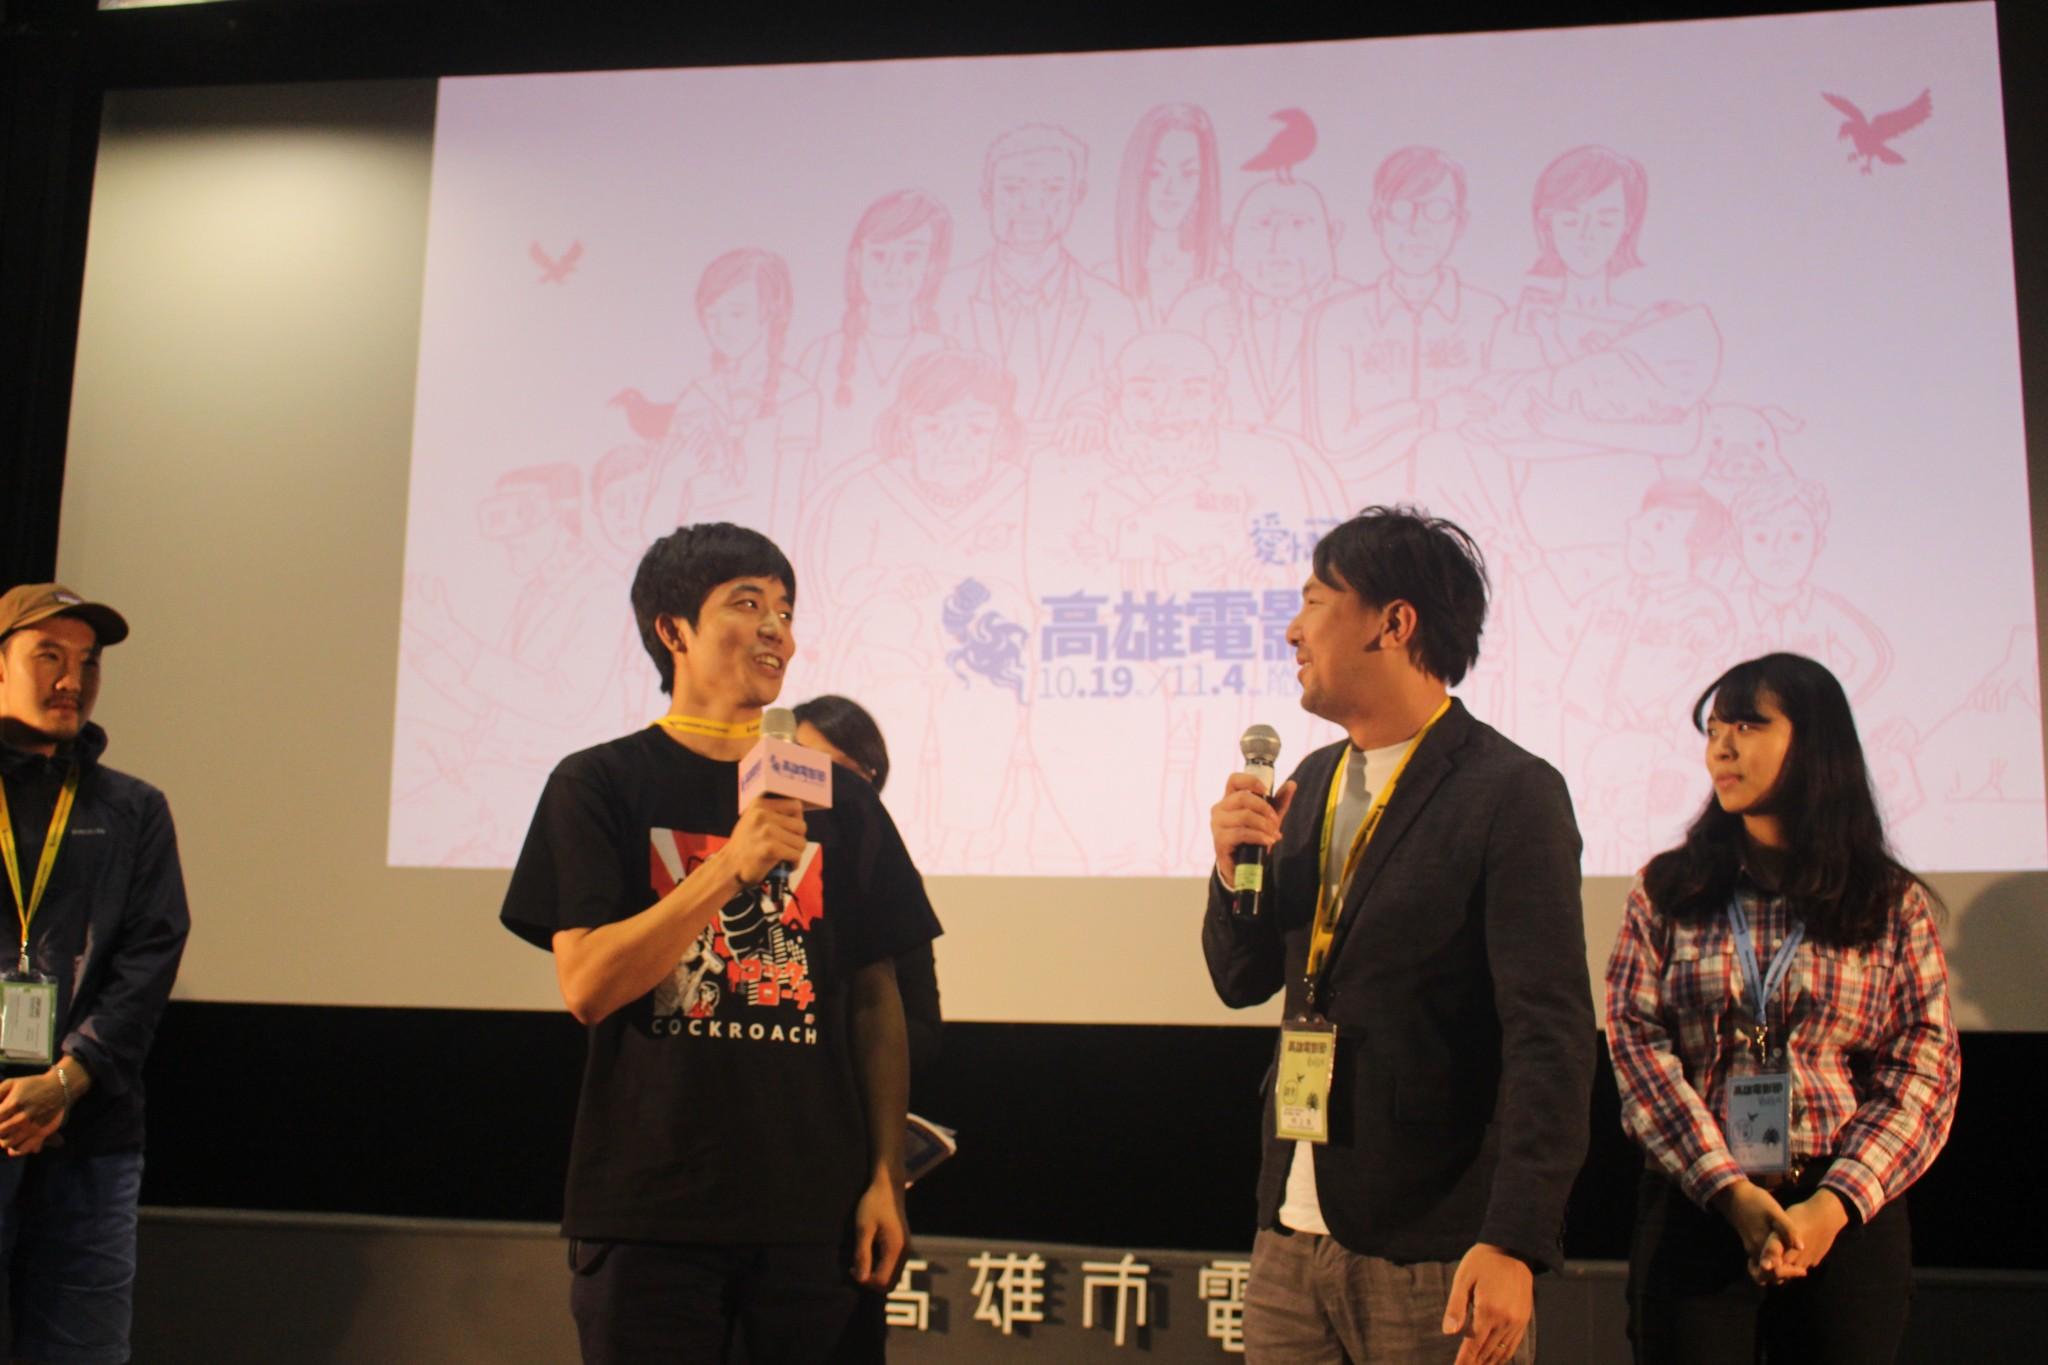 Festival Report: Asiana International